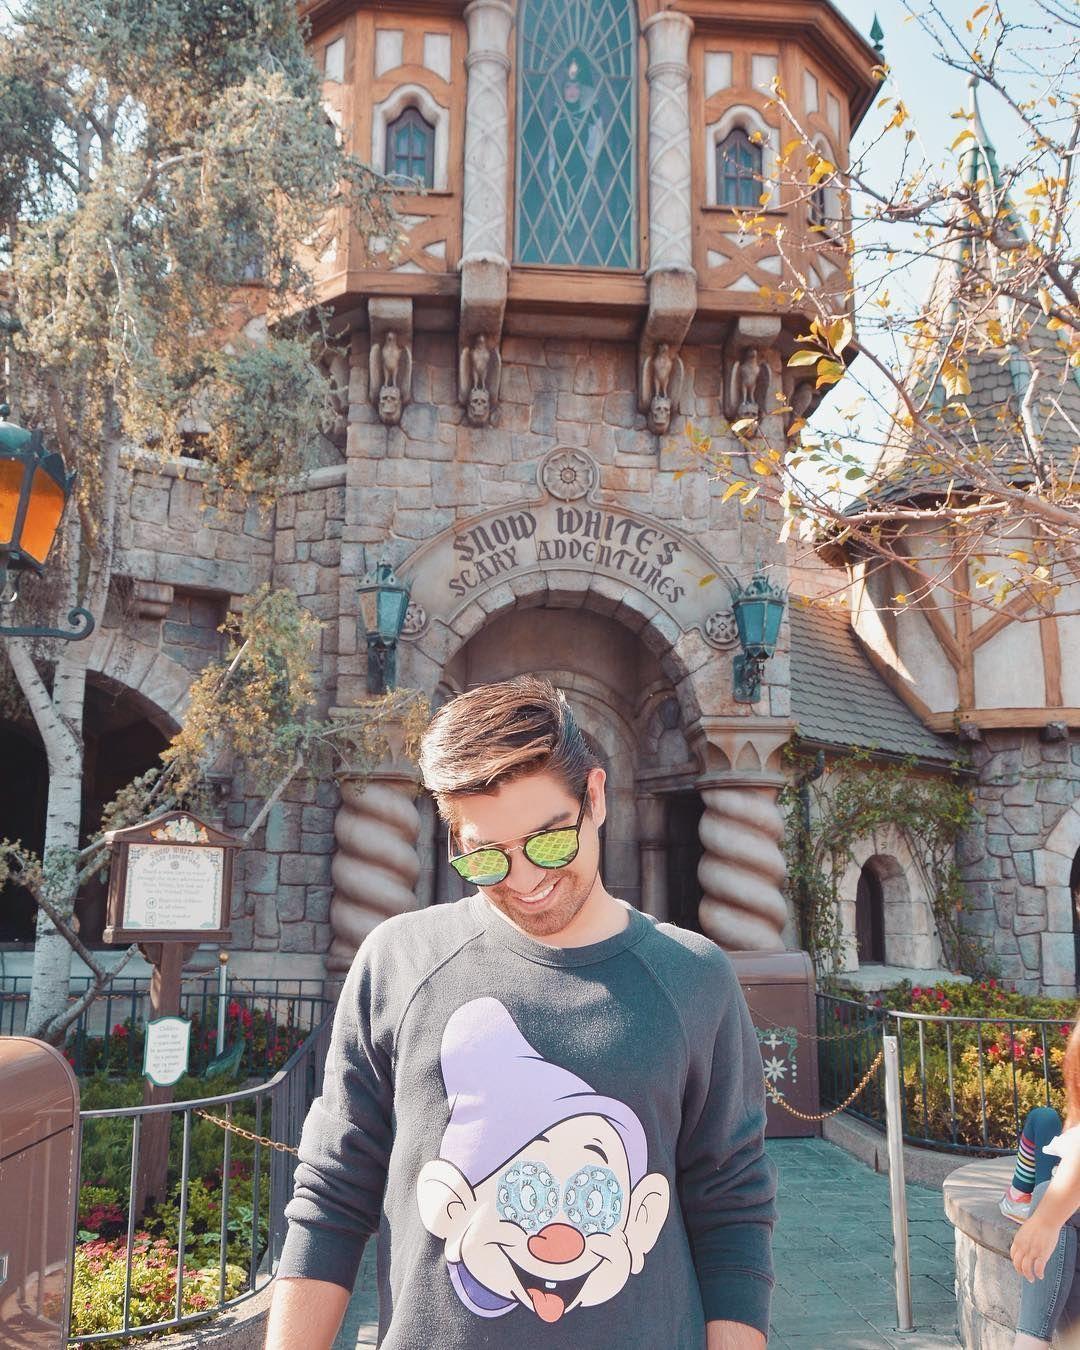 Asik dan Unik, Inilah Spot di Disneyland yang Membuatmu ingin Kesana